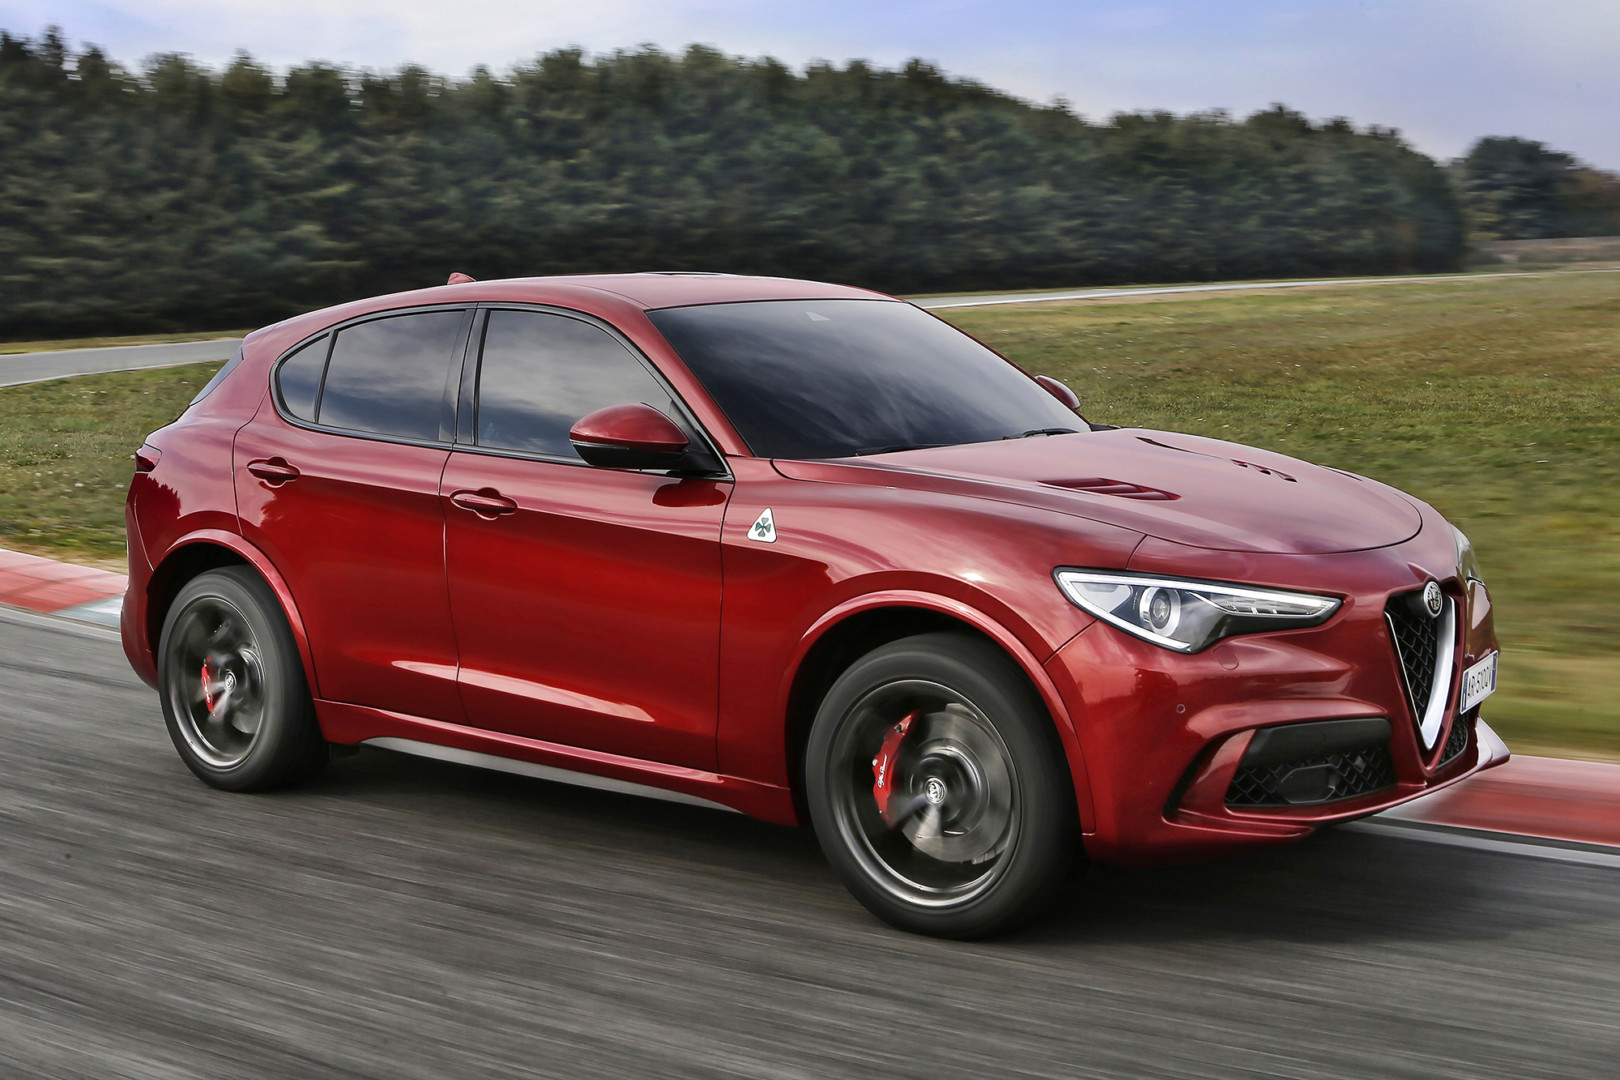 ¡Última hora! Alfa Romeo tiene preparada una sorpresa para Ginebra